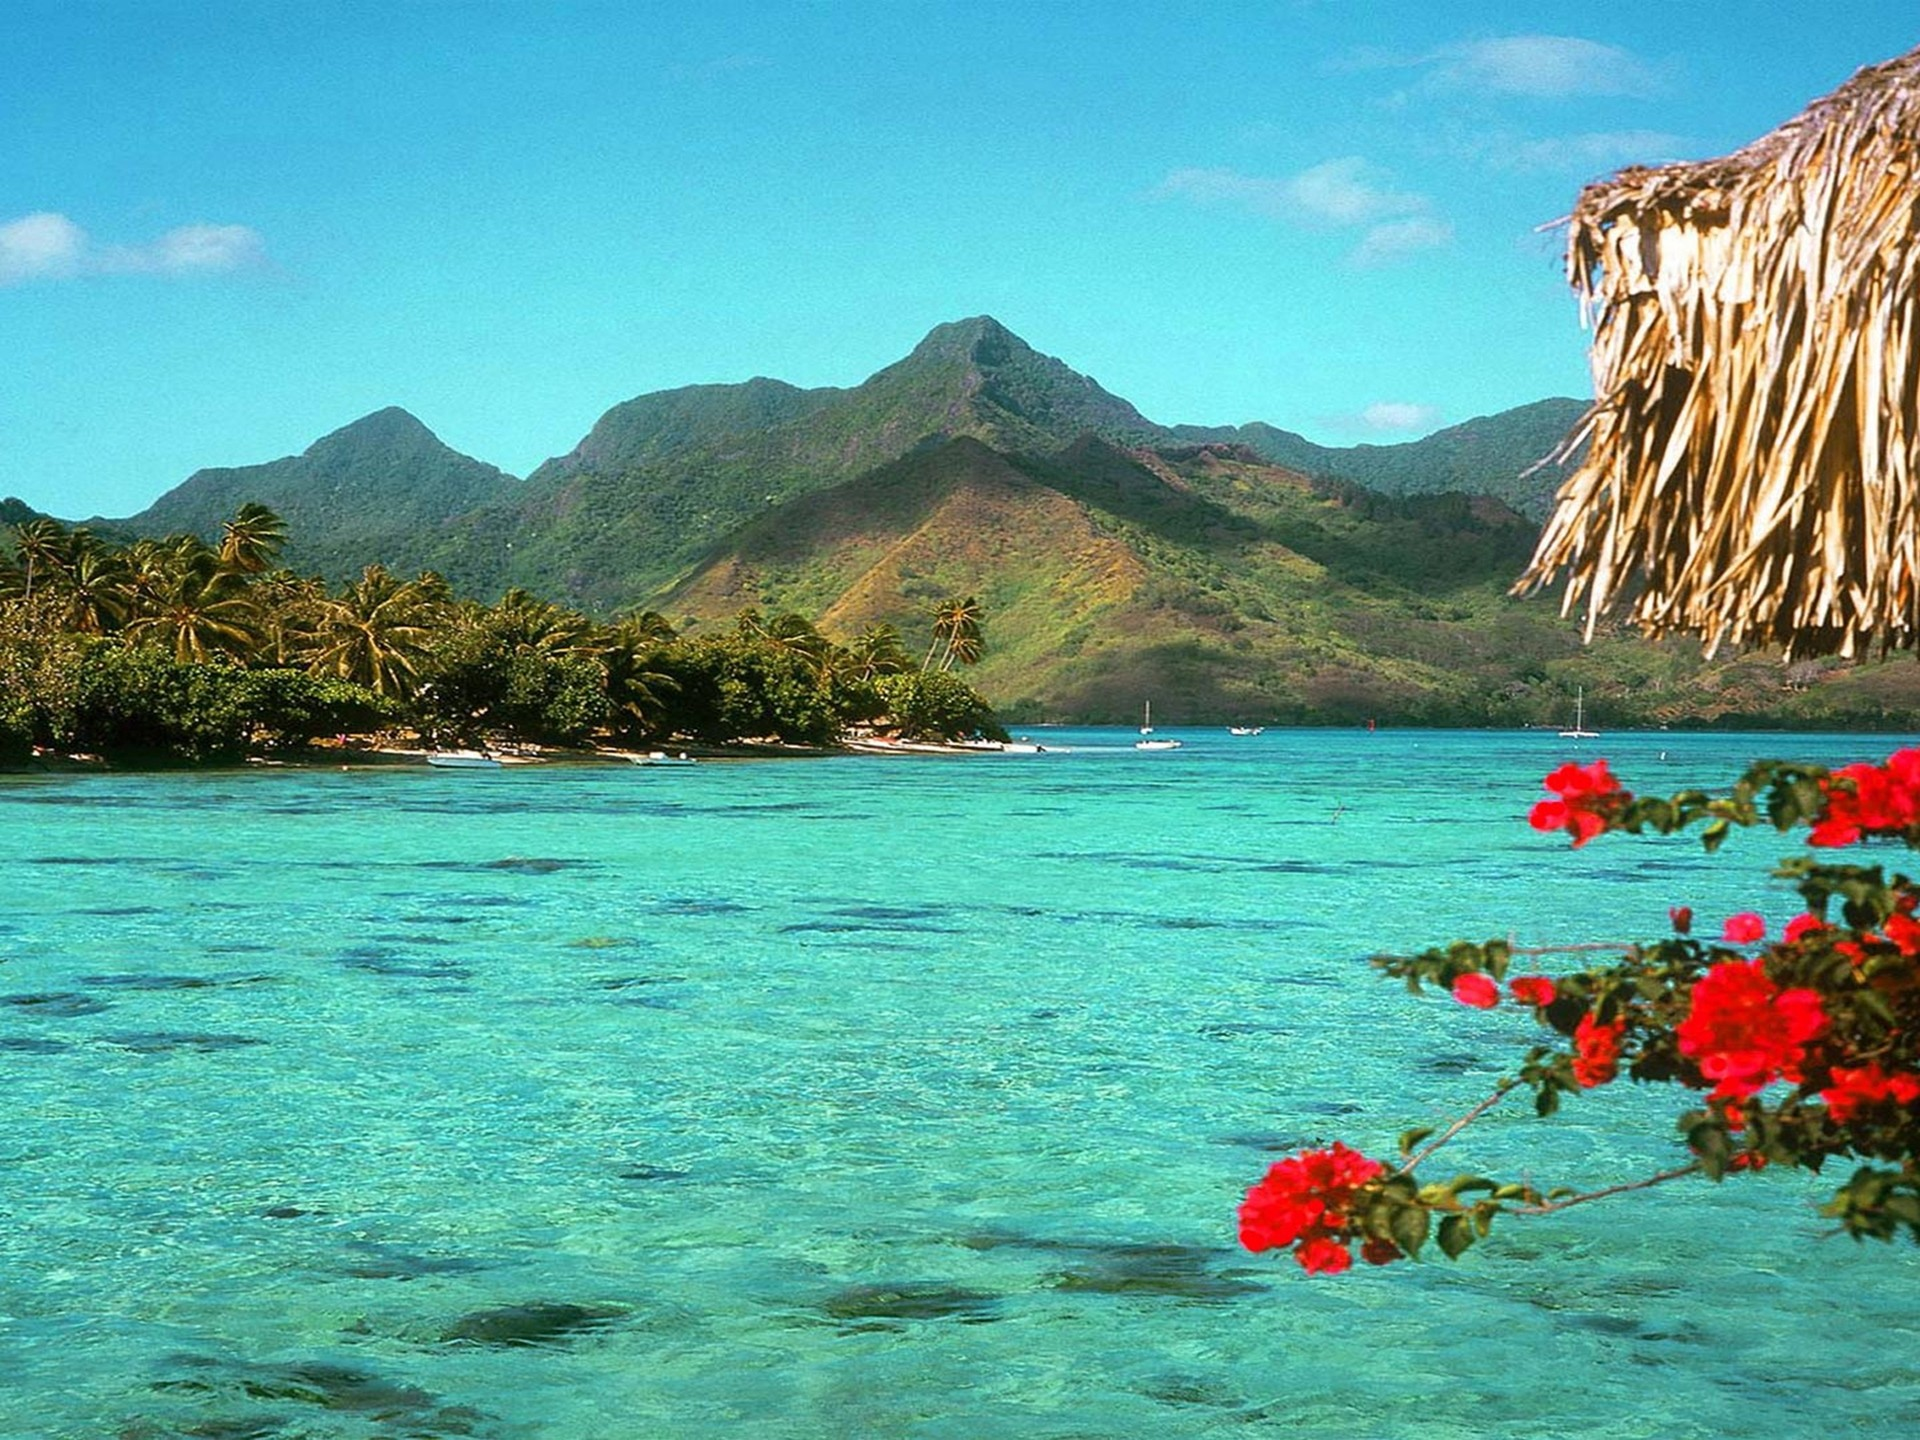 Tropical Beach Screensavers And Wallpaper: Tropical Beach Wallpaper Desktop